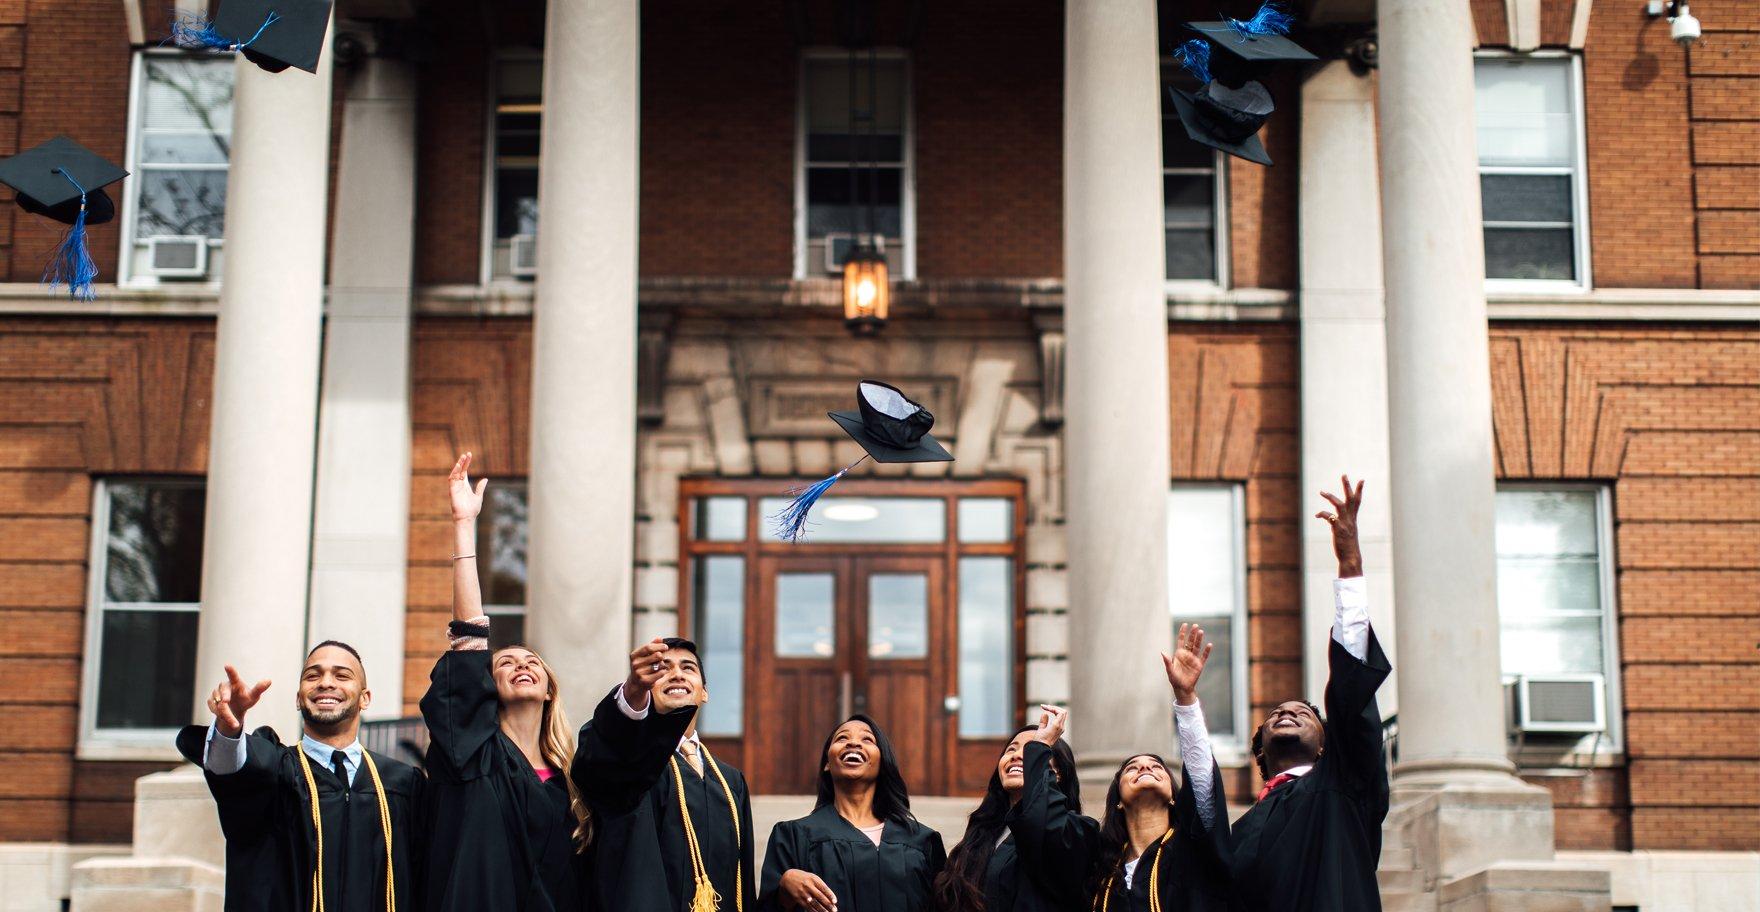 College Graduates celebrating graduation